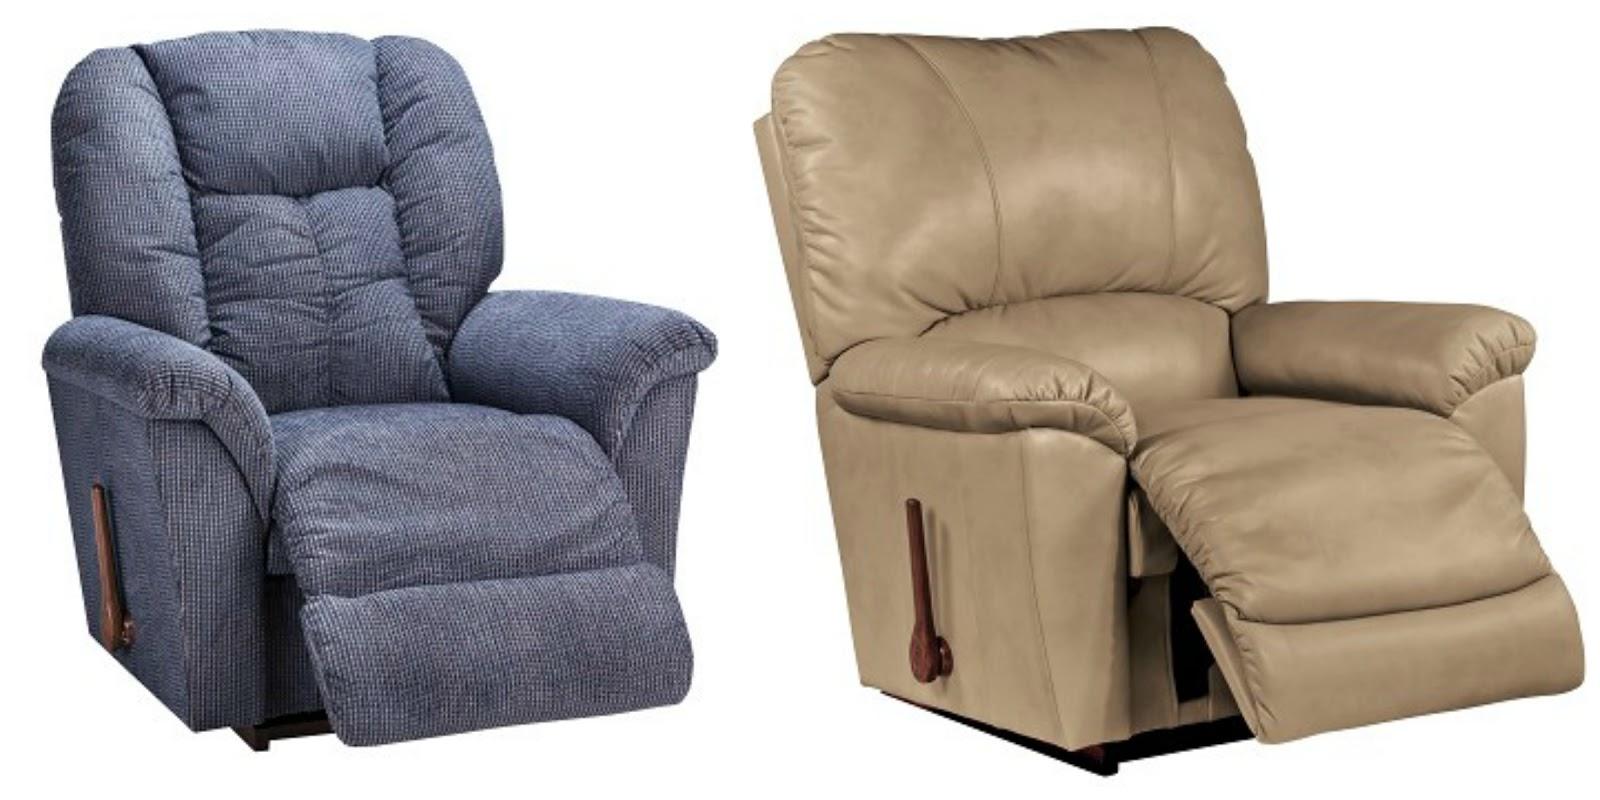 Slumberland Sofa Recliners Microfiber Leather Look Furniture Store Osage Beach Mo